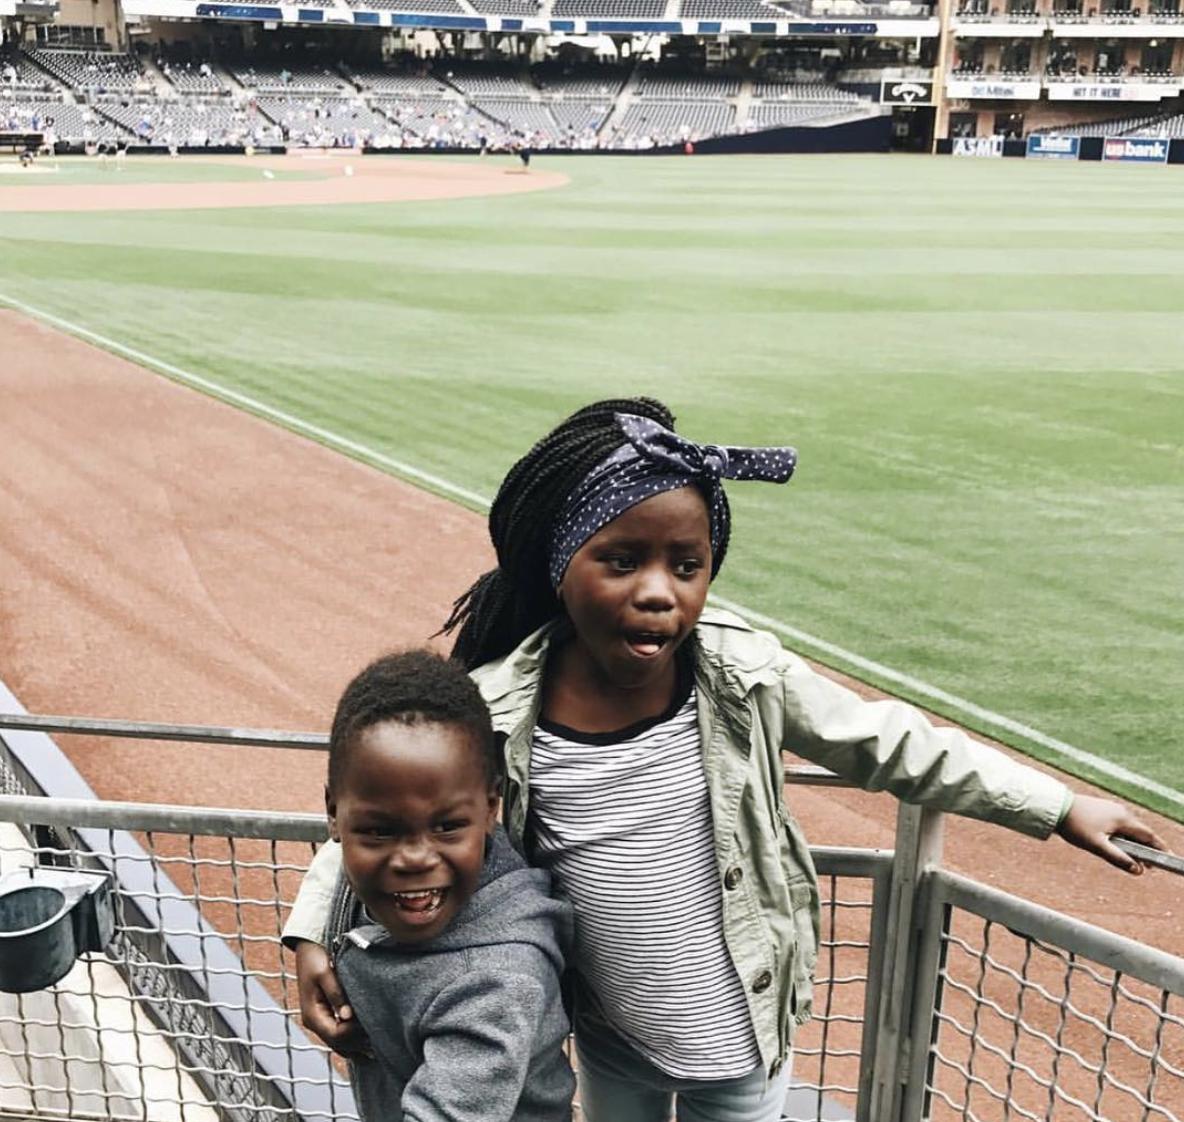 Baseball games with the cutest kids of @graceandsalt